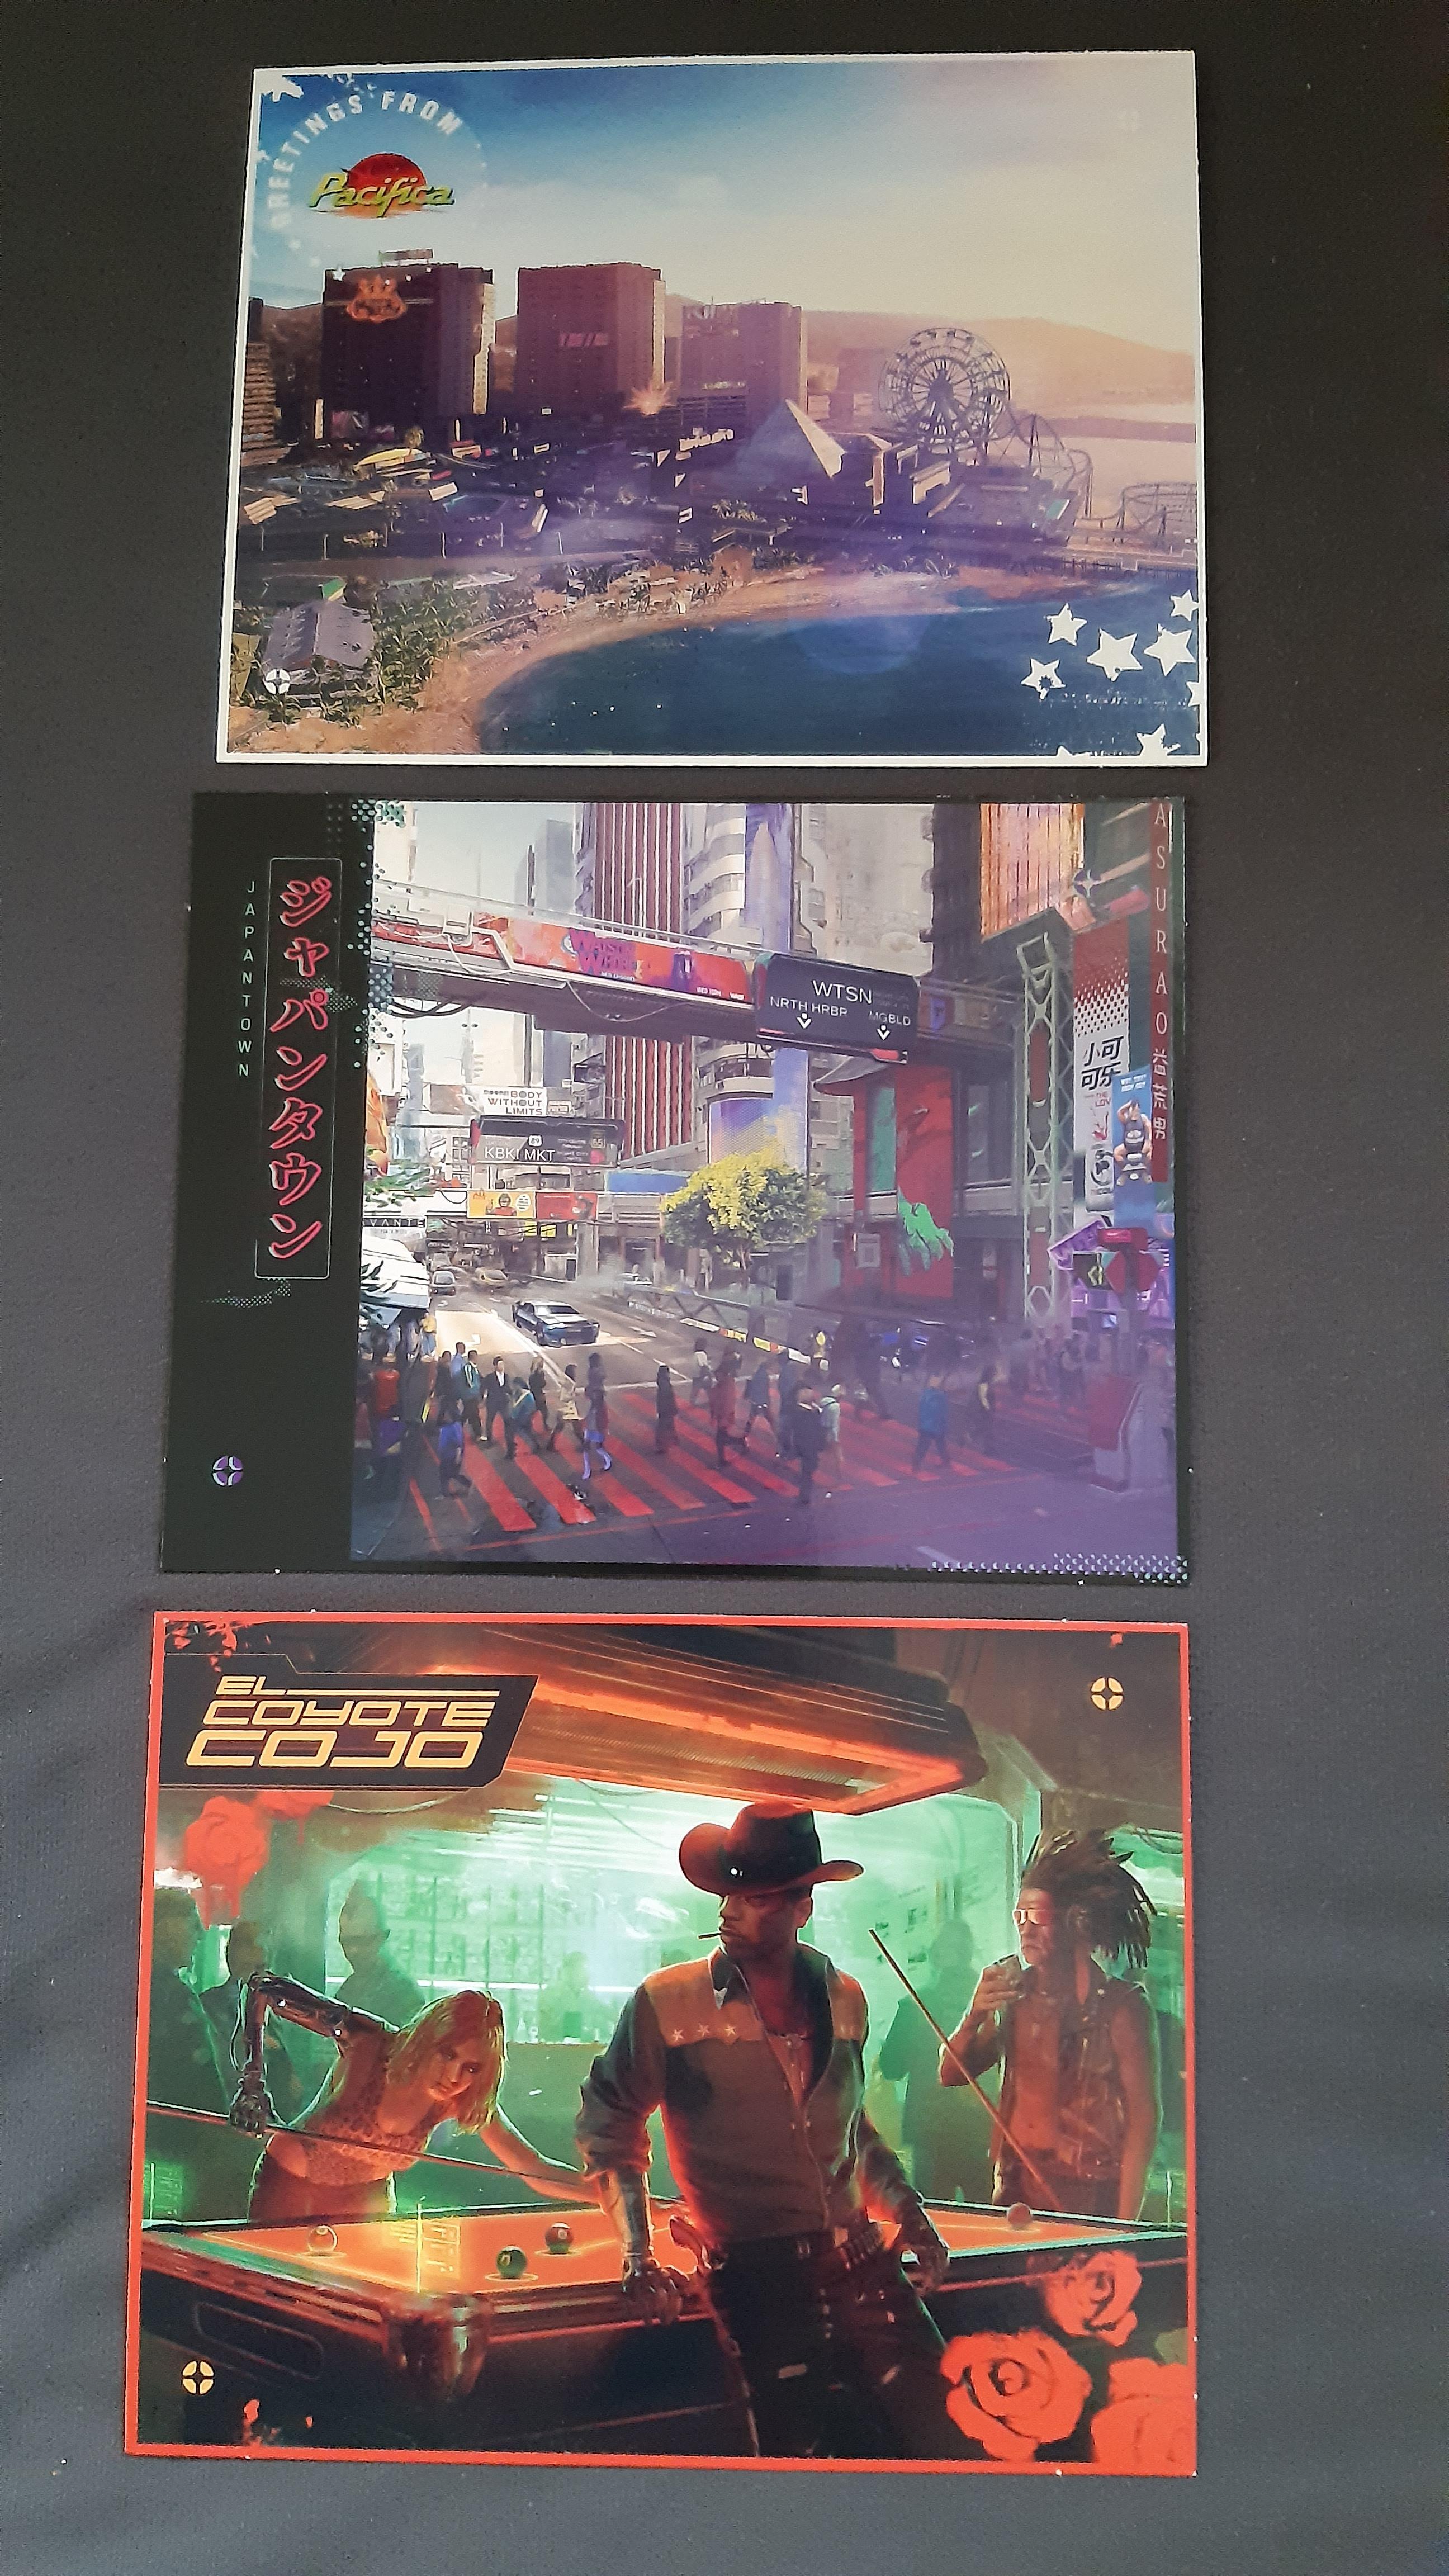 Утечка: Карта Найт-Сити и открытки из физического издания Cyberpunk 2077